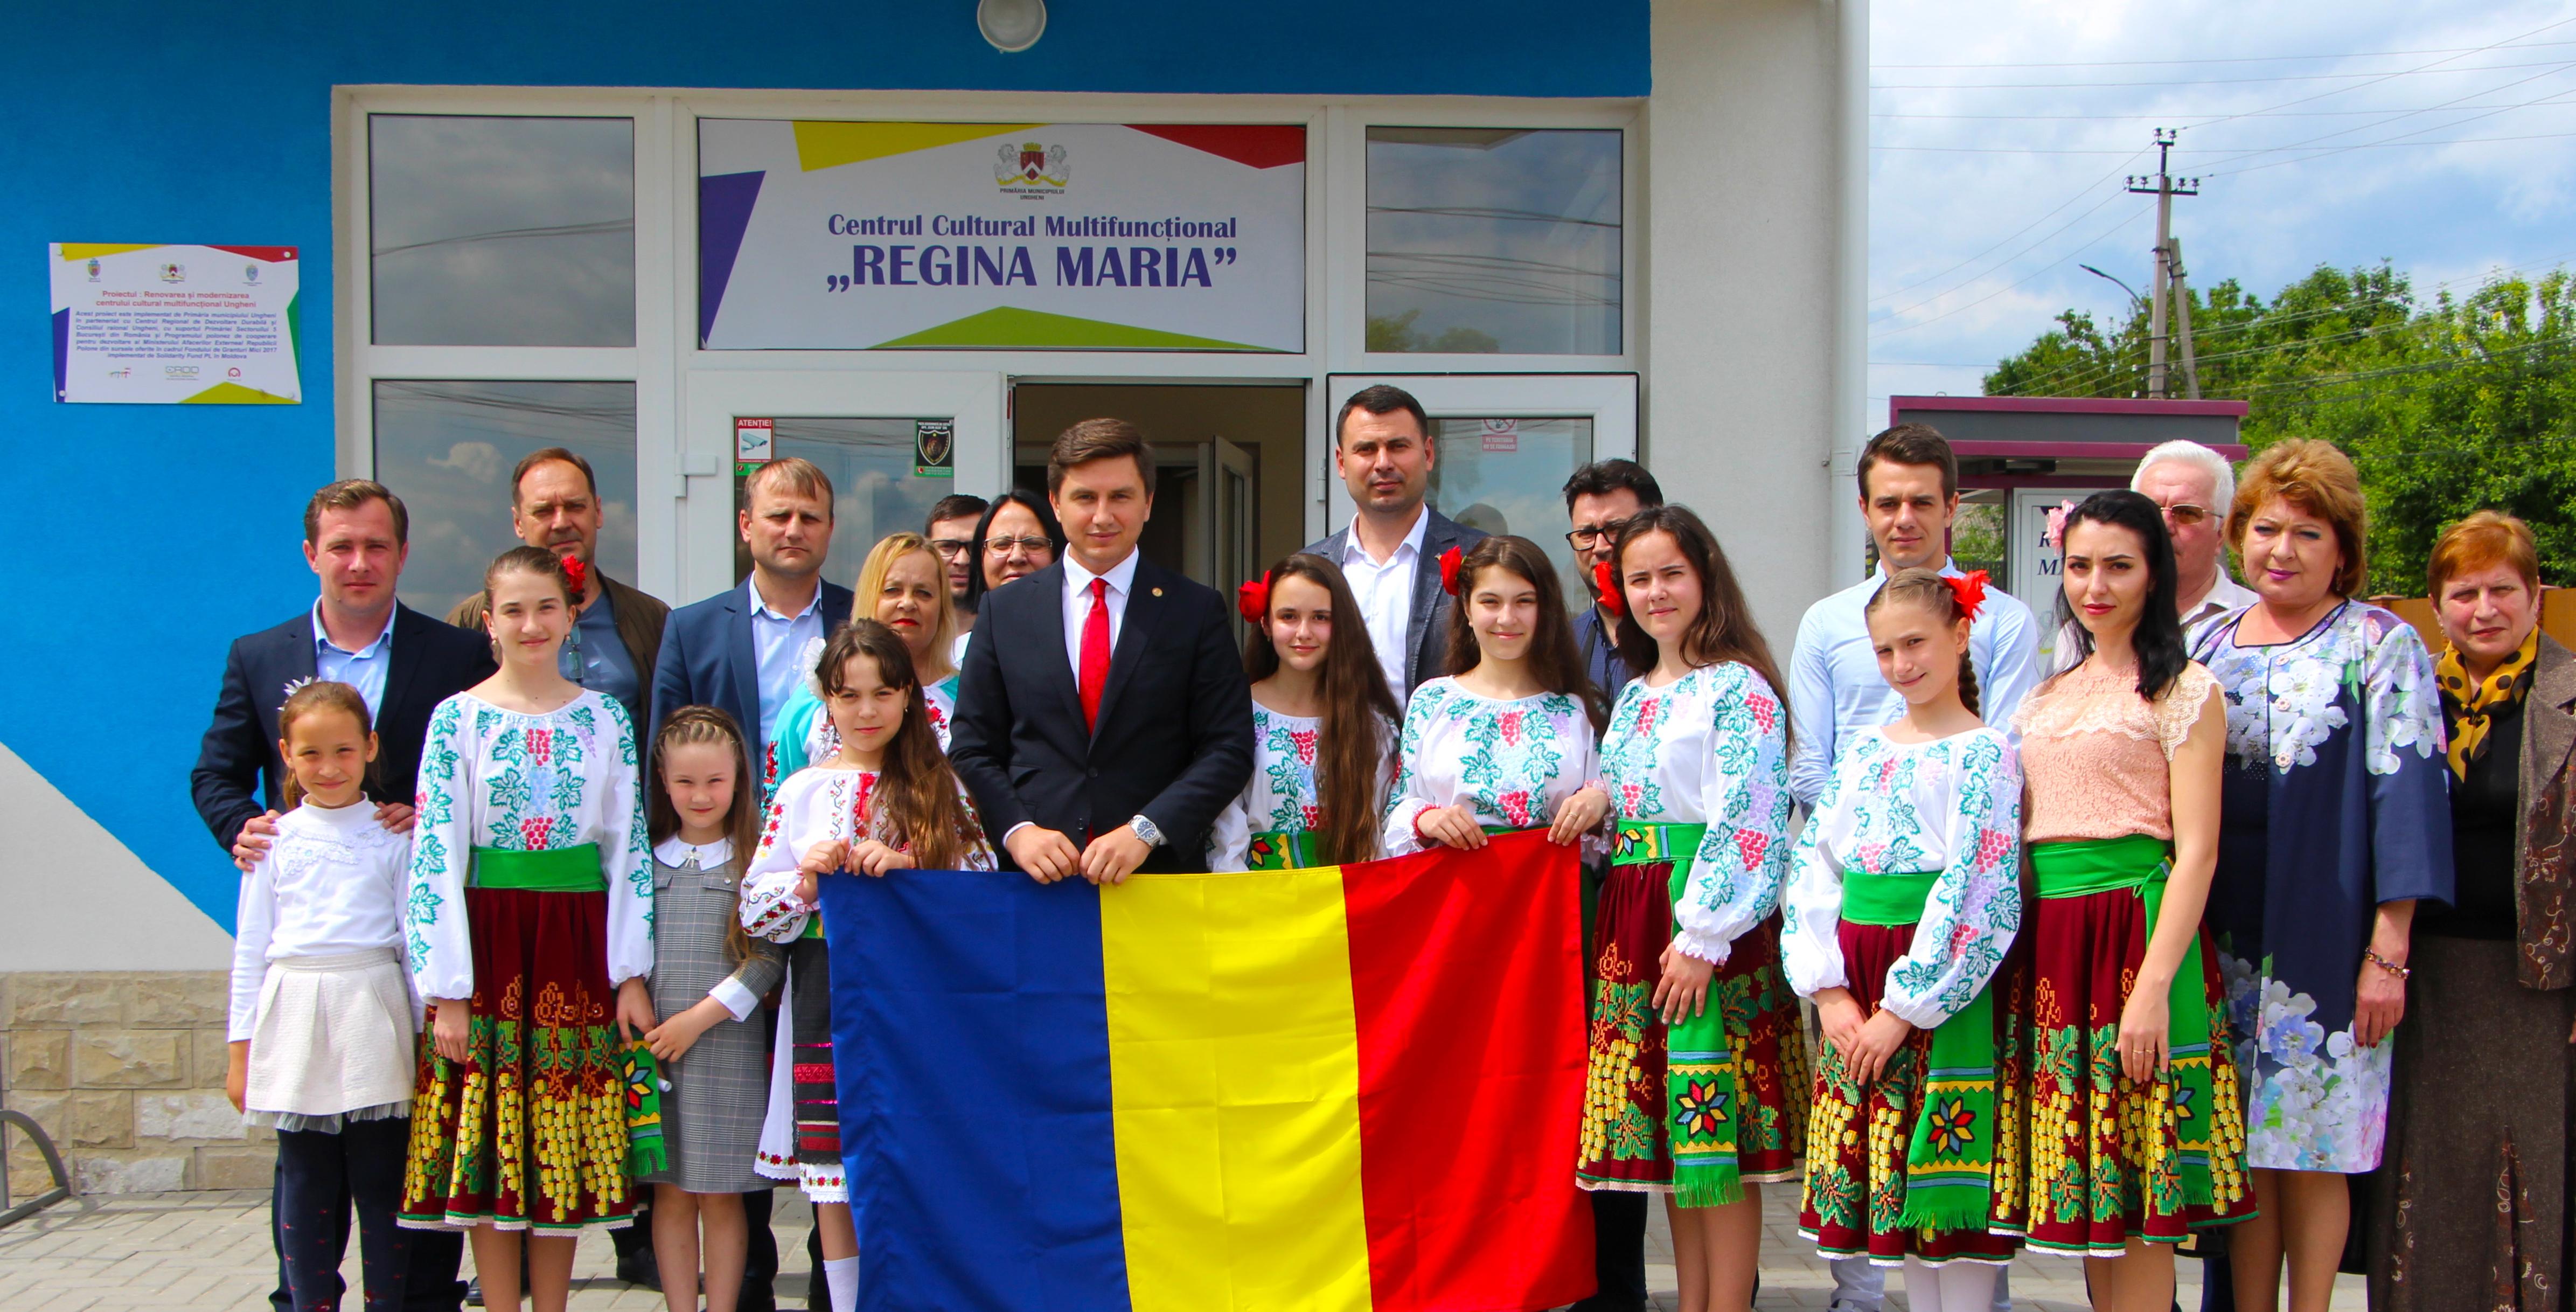 Constantin Codreanu Centrul Cultural Multifunctional Regina Maria